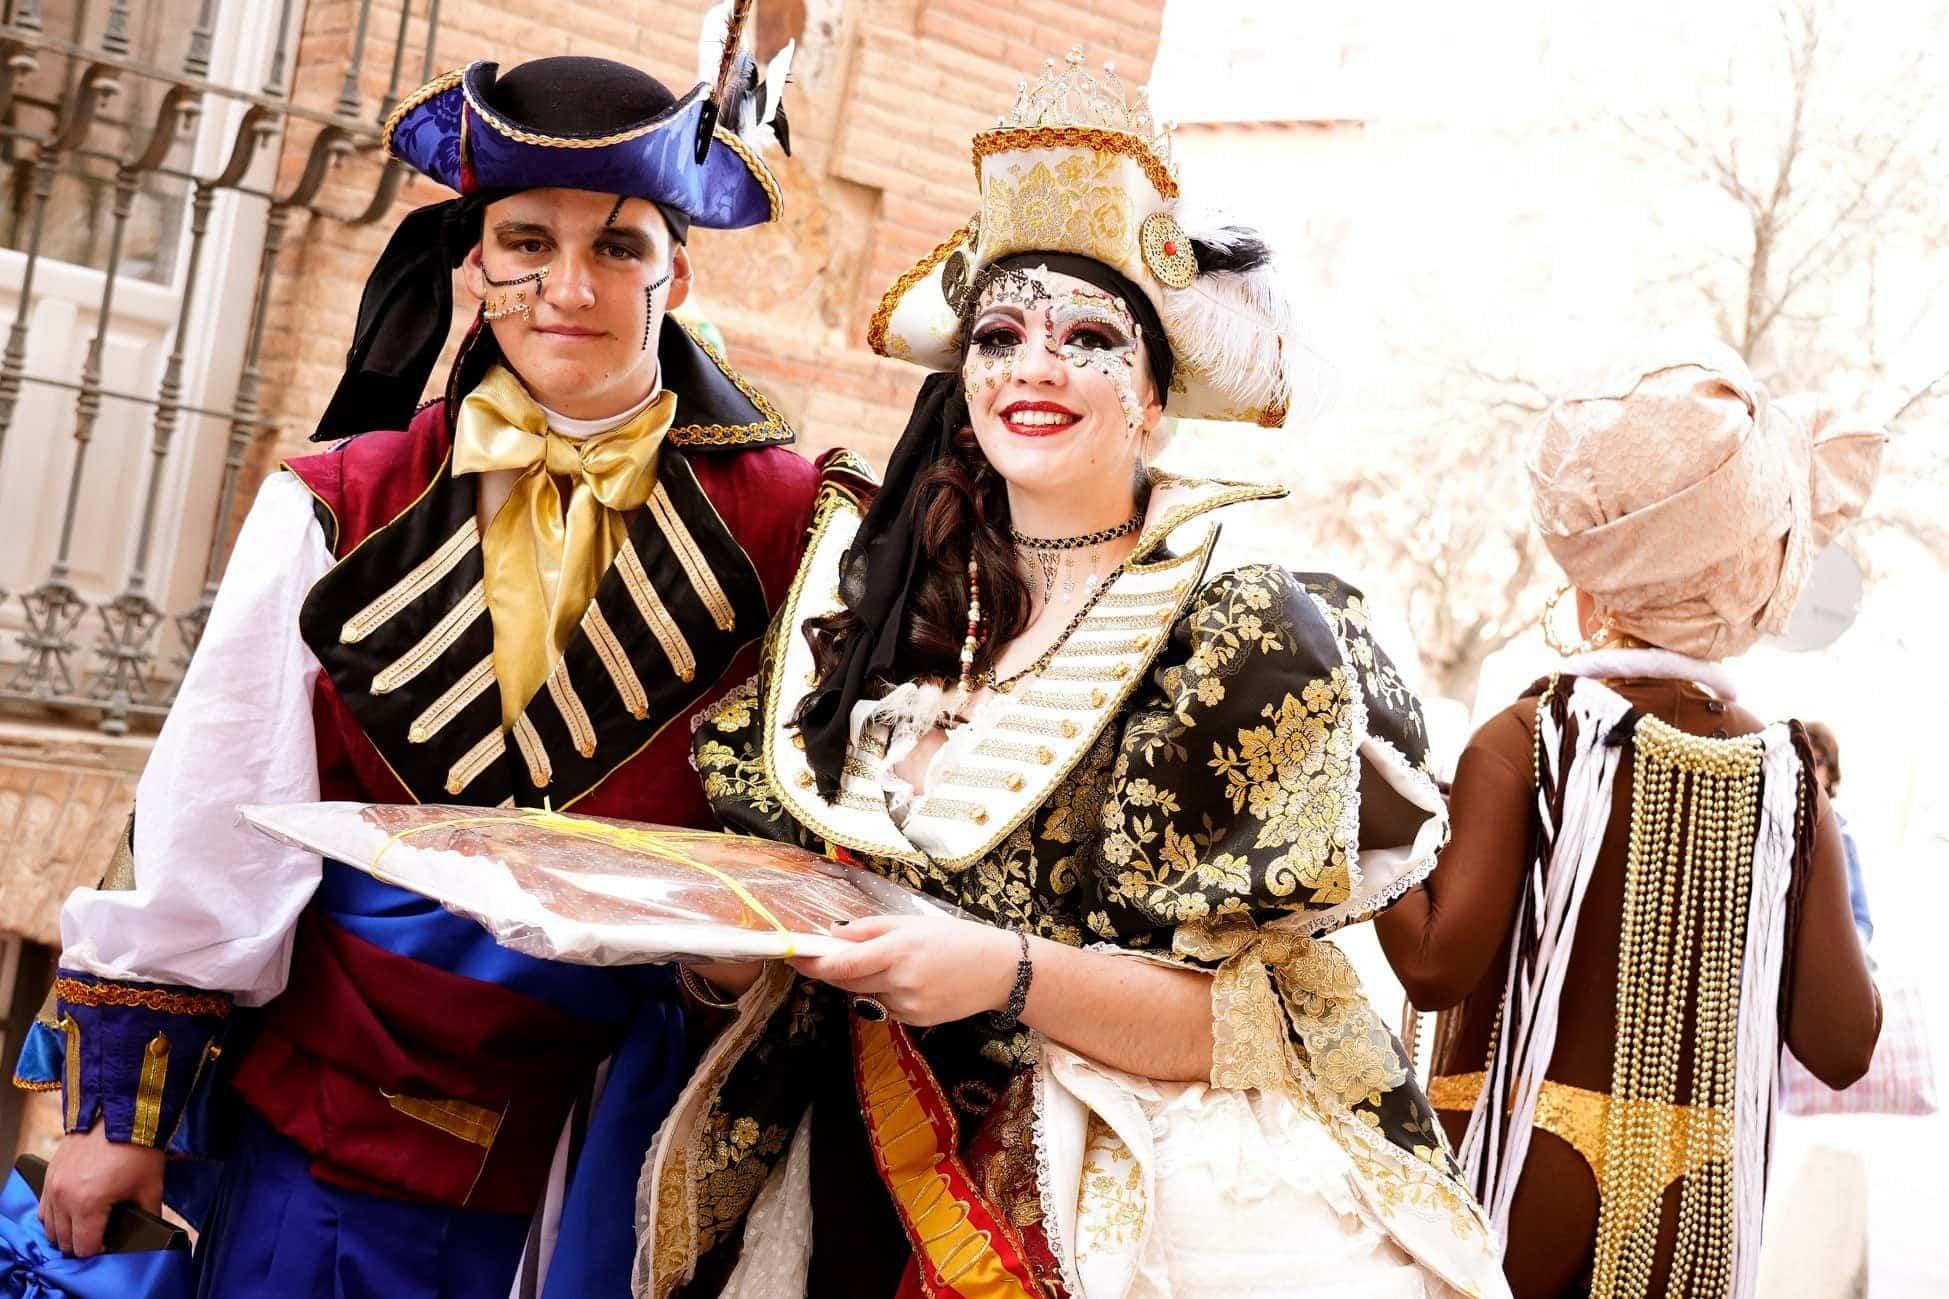 Carnaval de herencia 2020 ofertorio 135 - Selección de fotografías del Ofertorio del Carnaval de Herencia